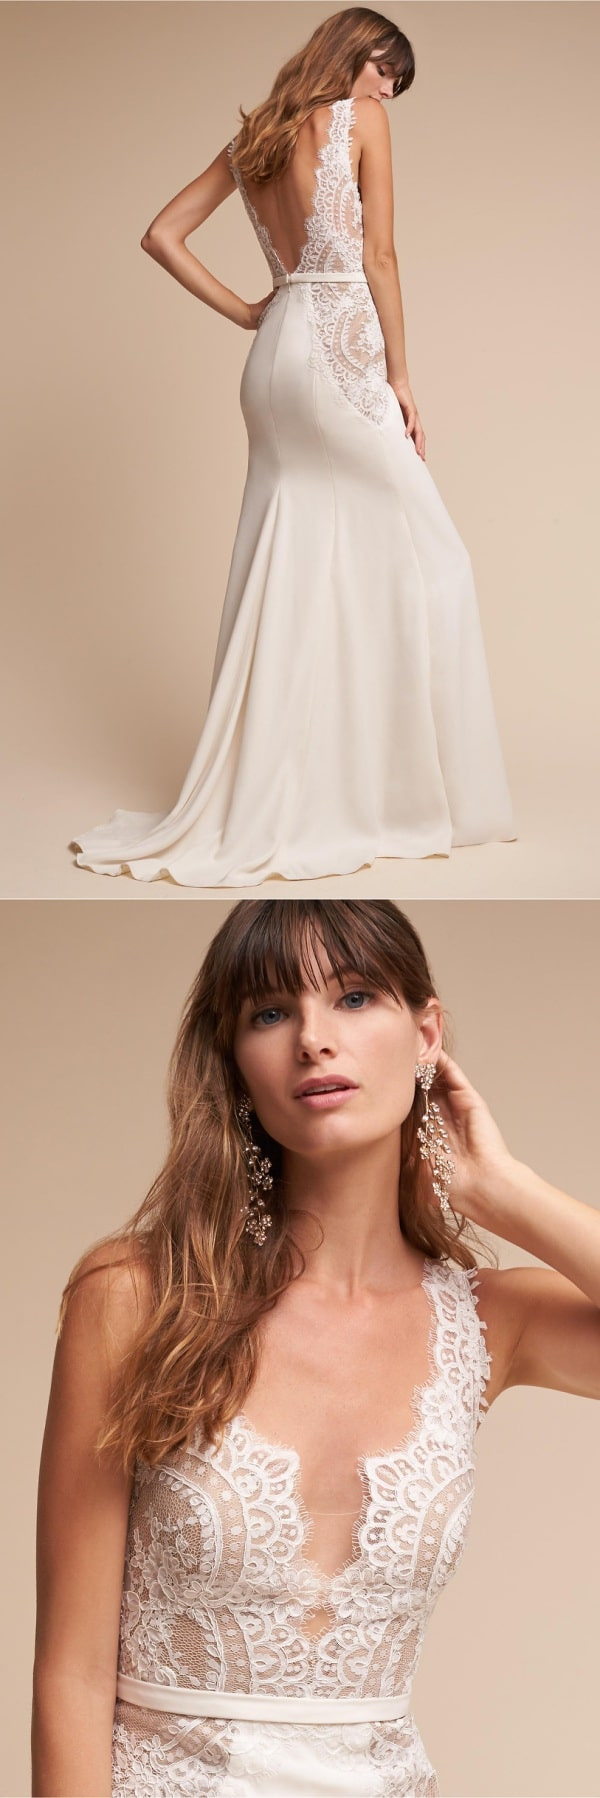 Sexy sheer lace bodice wedding dress